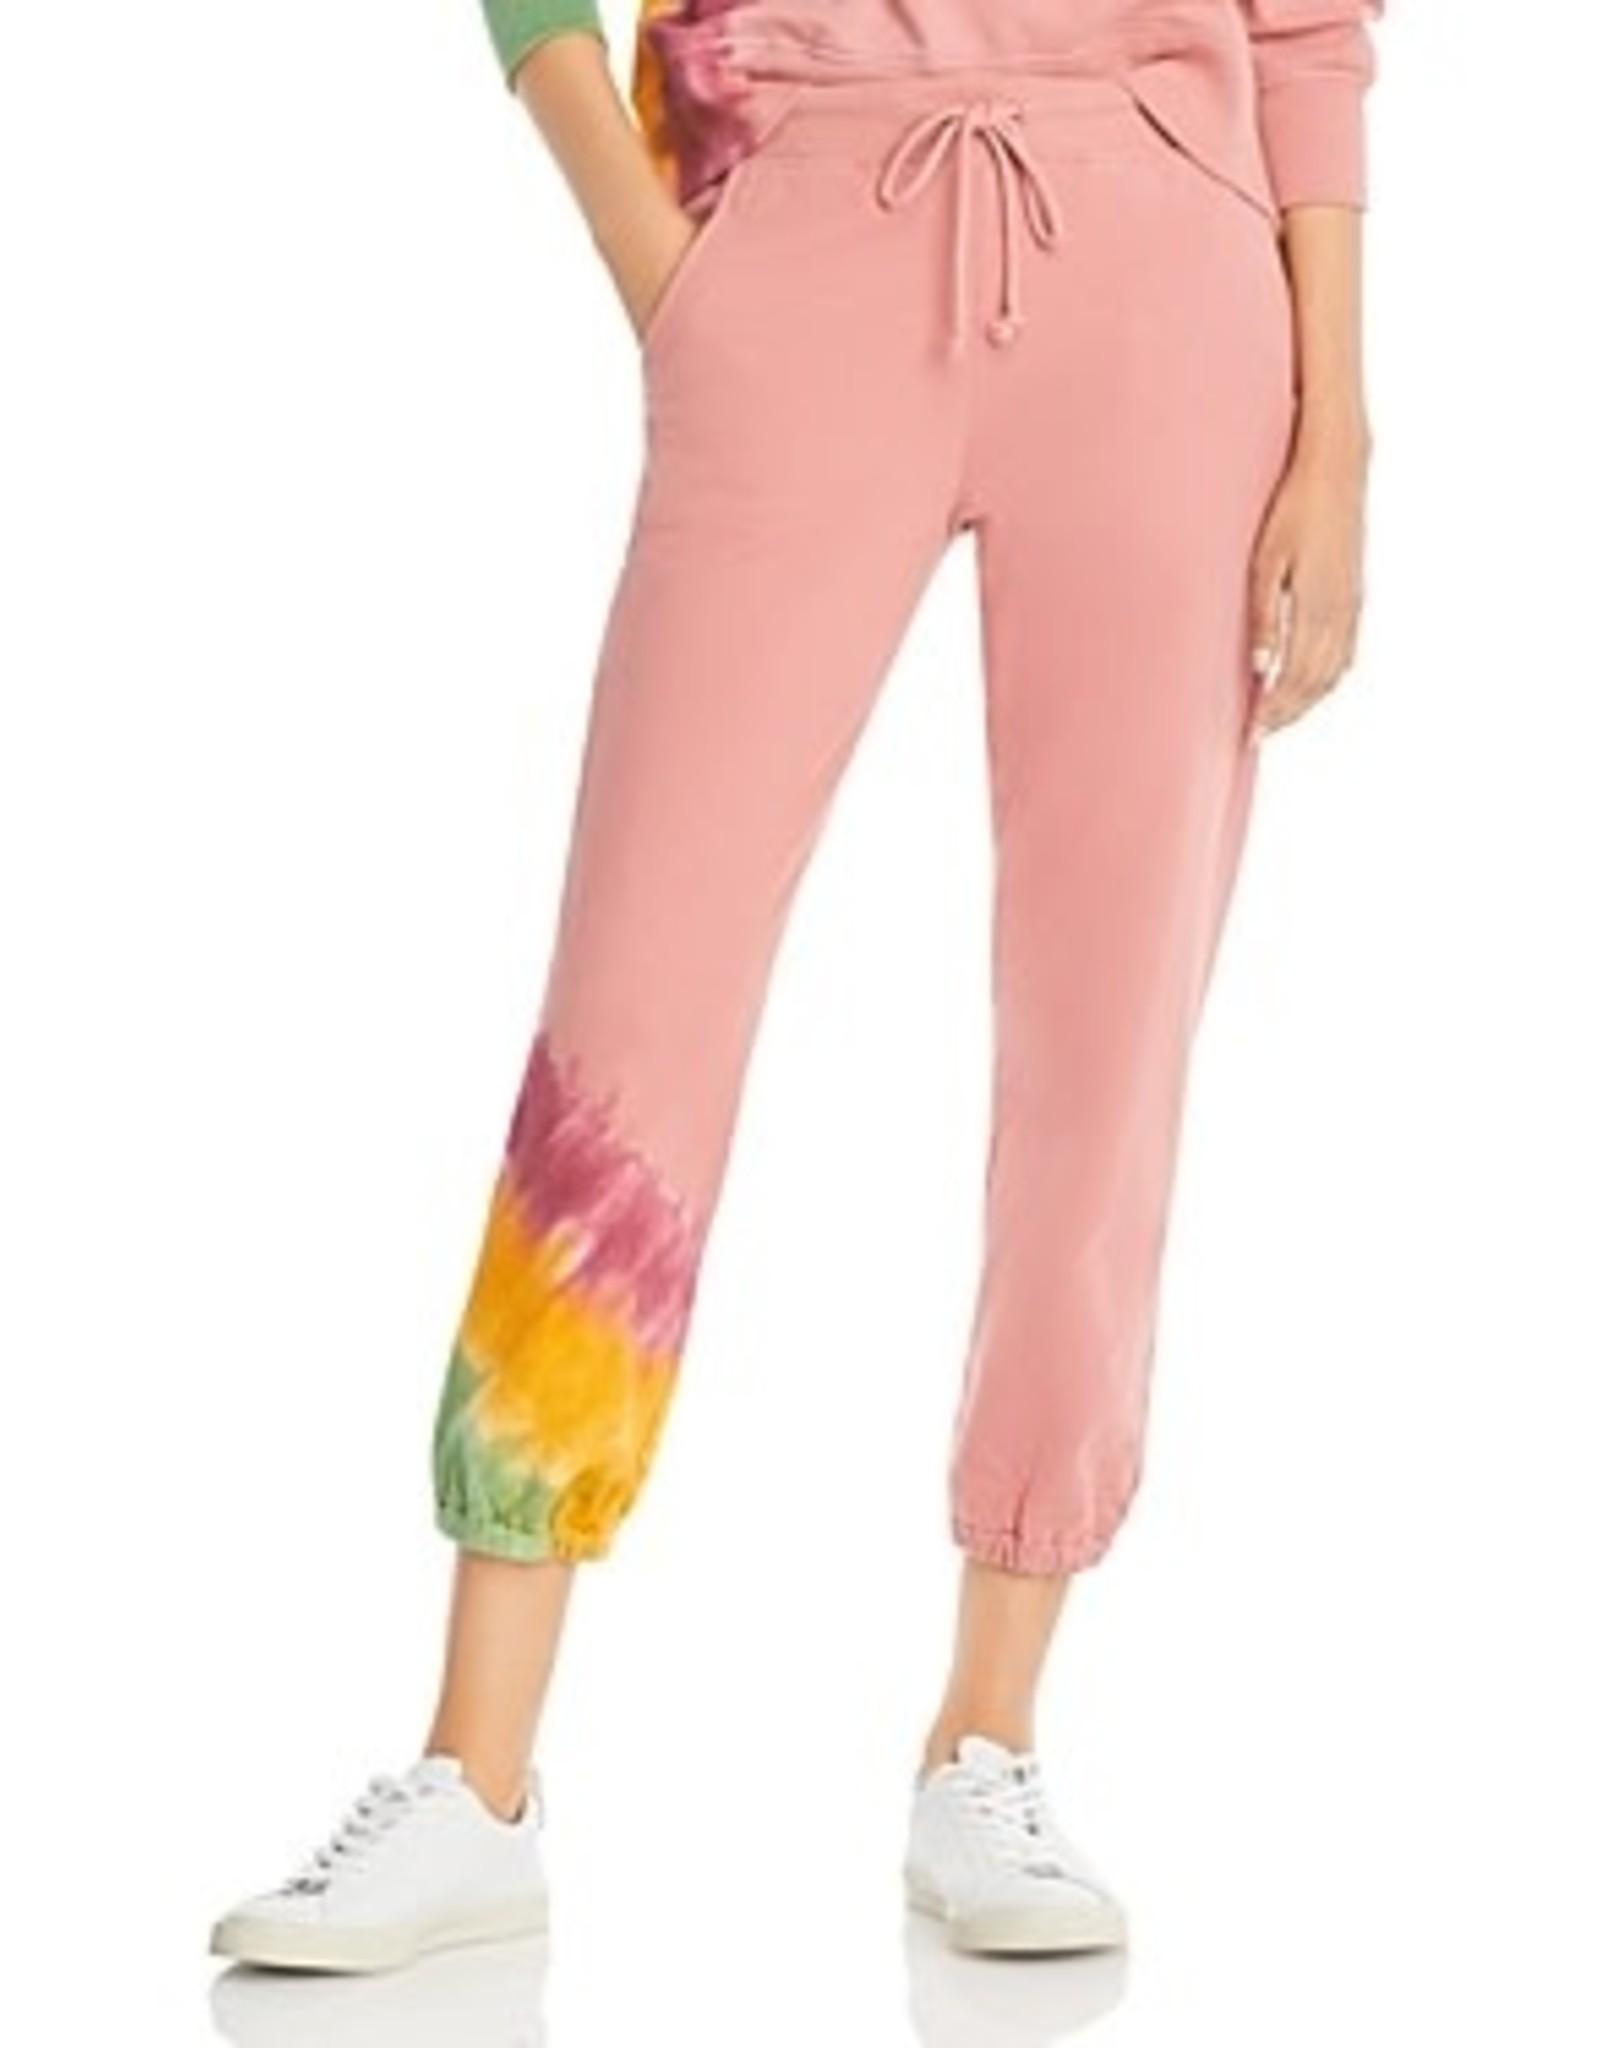 Velvet Nissa 04 Tie Dye Sweatpants Sz Medium